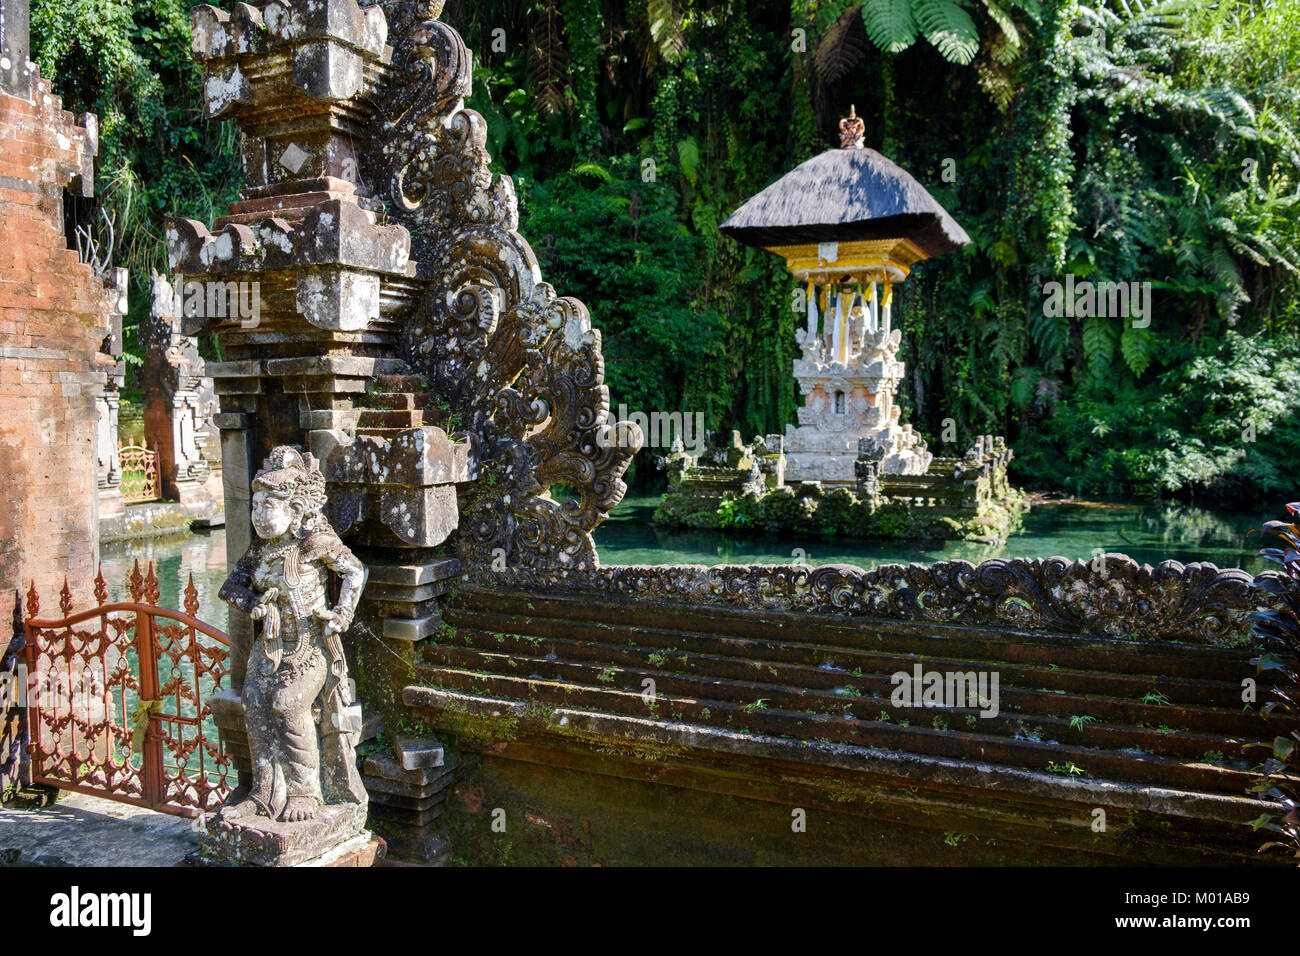 Statue and 'candi bentar' (split gate) with pond shrine at Pura Gunung Kawi Sebatu, a temple near Ubud, - Stock Image